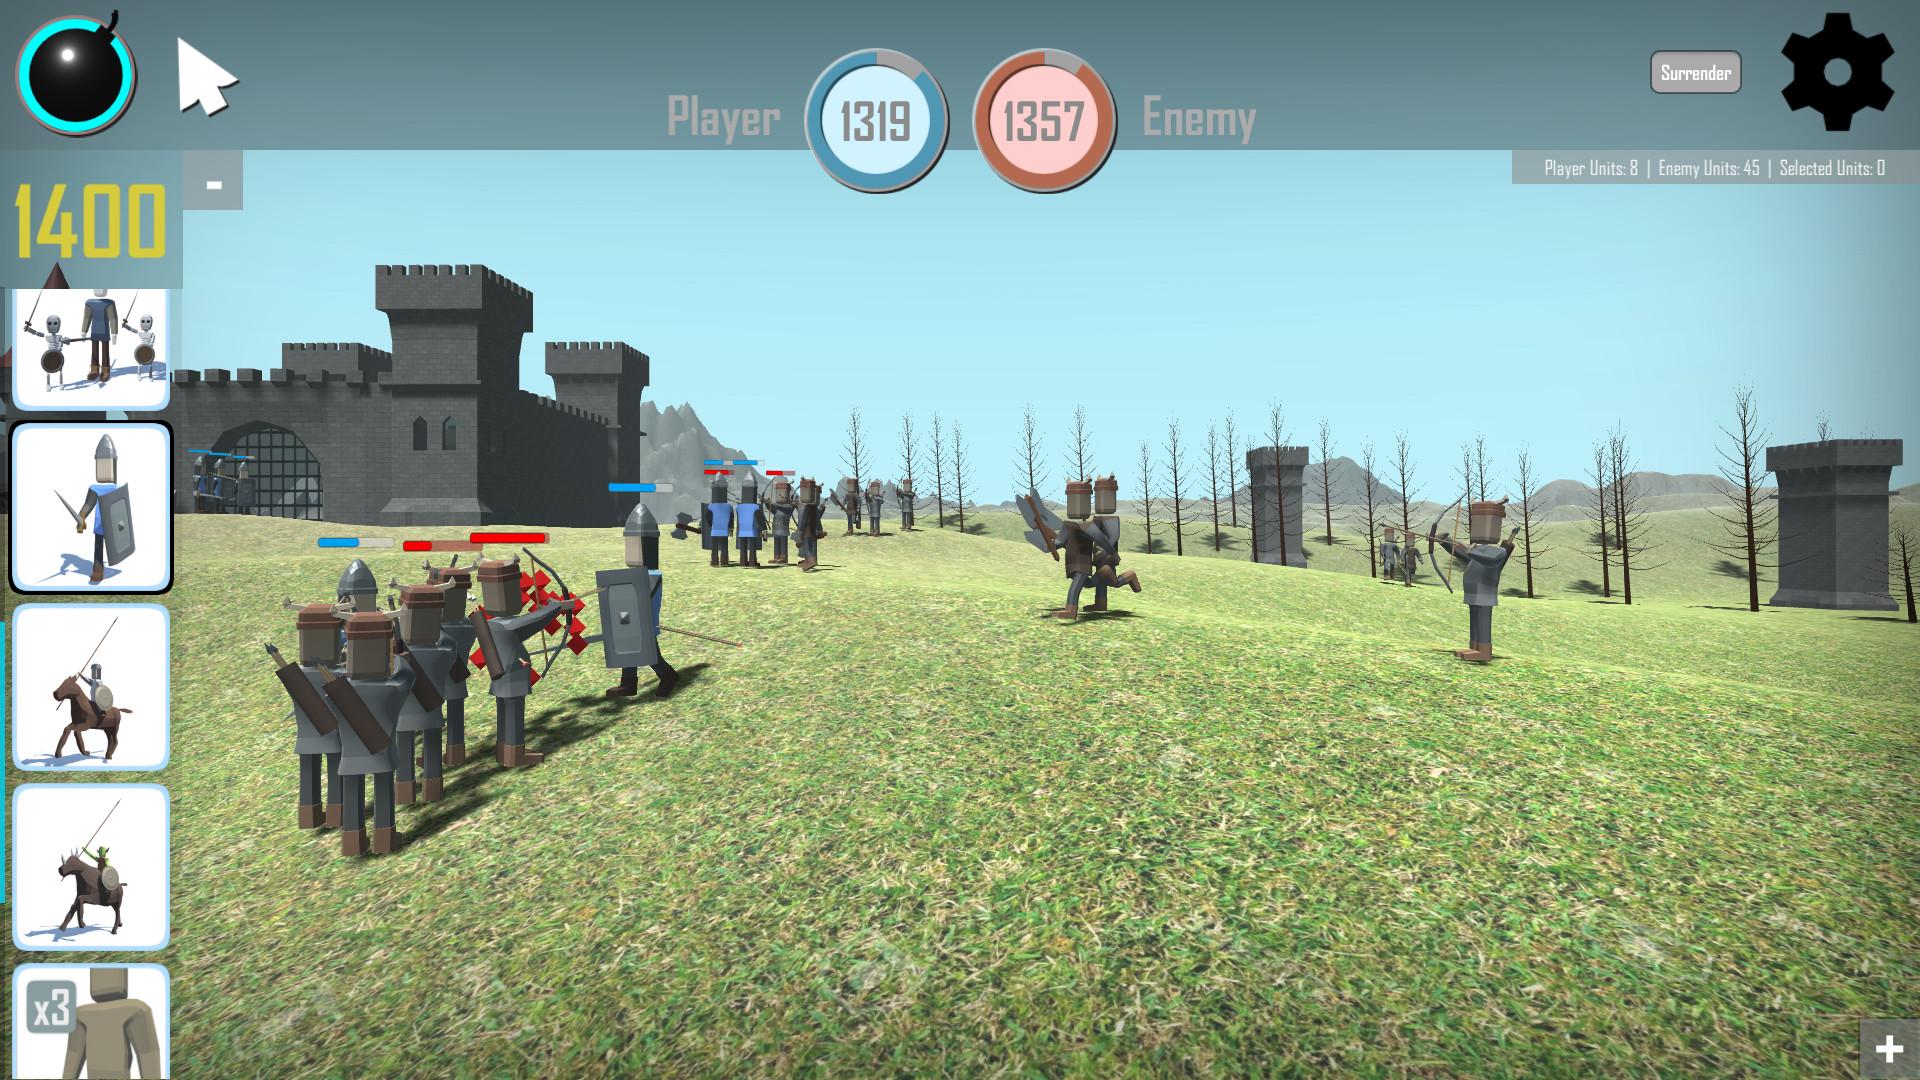 Clash of Castle screenshot